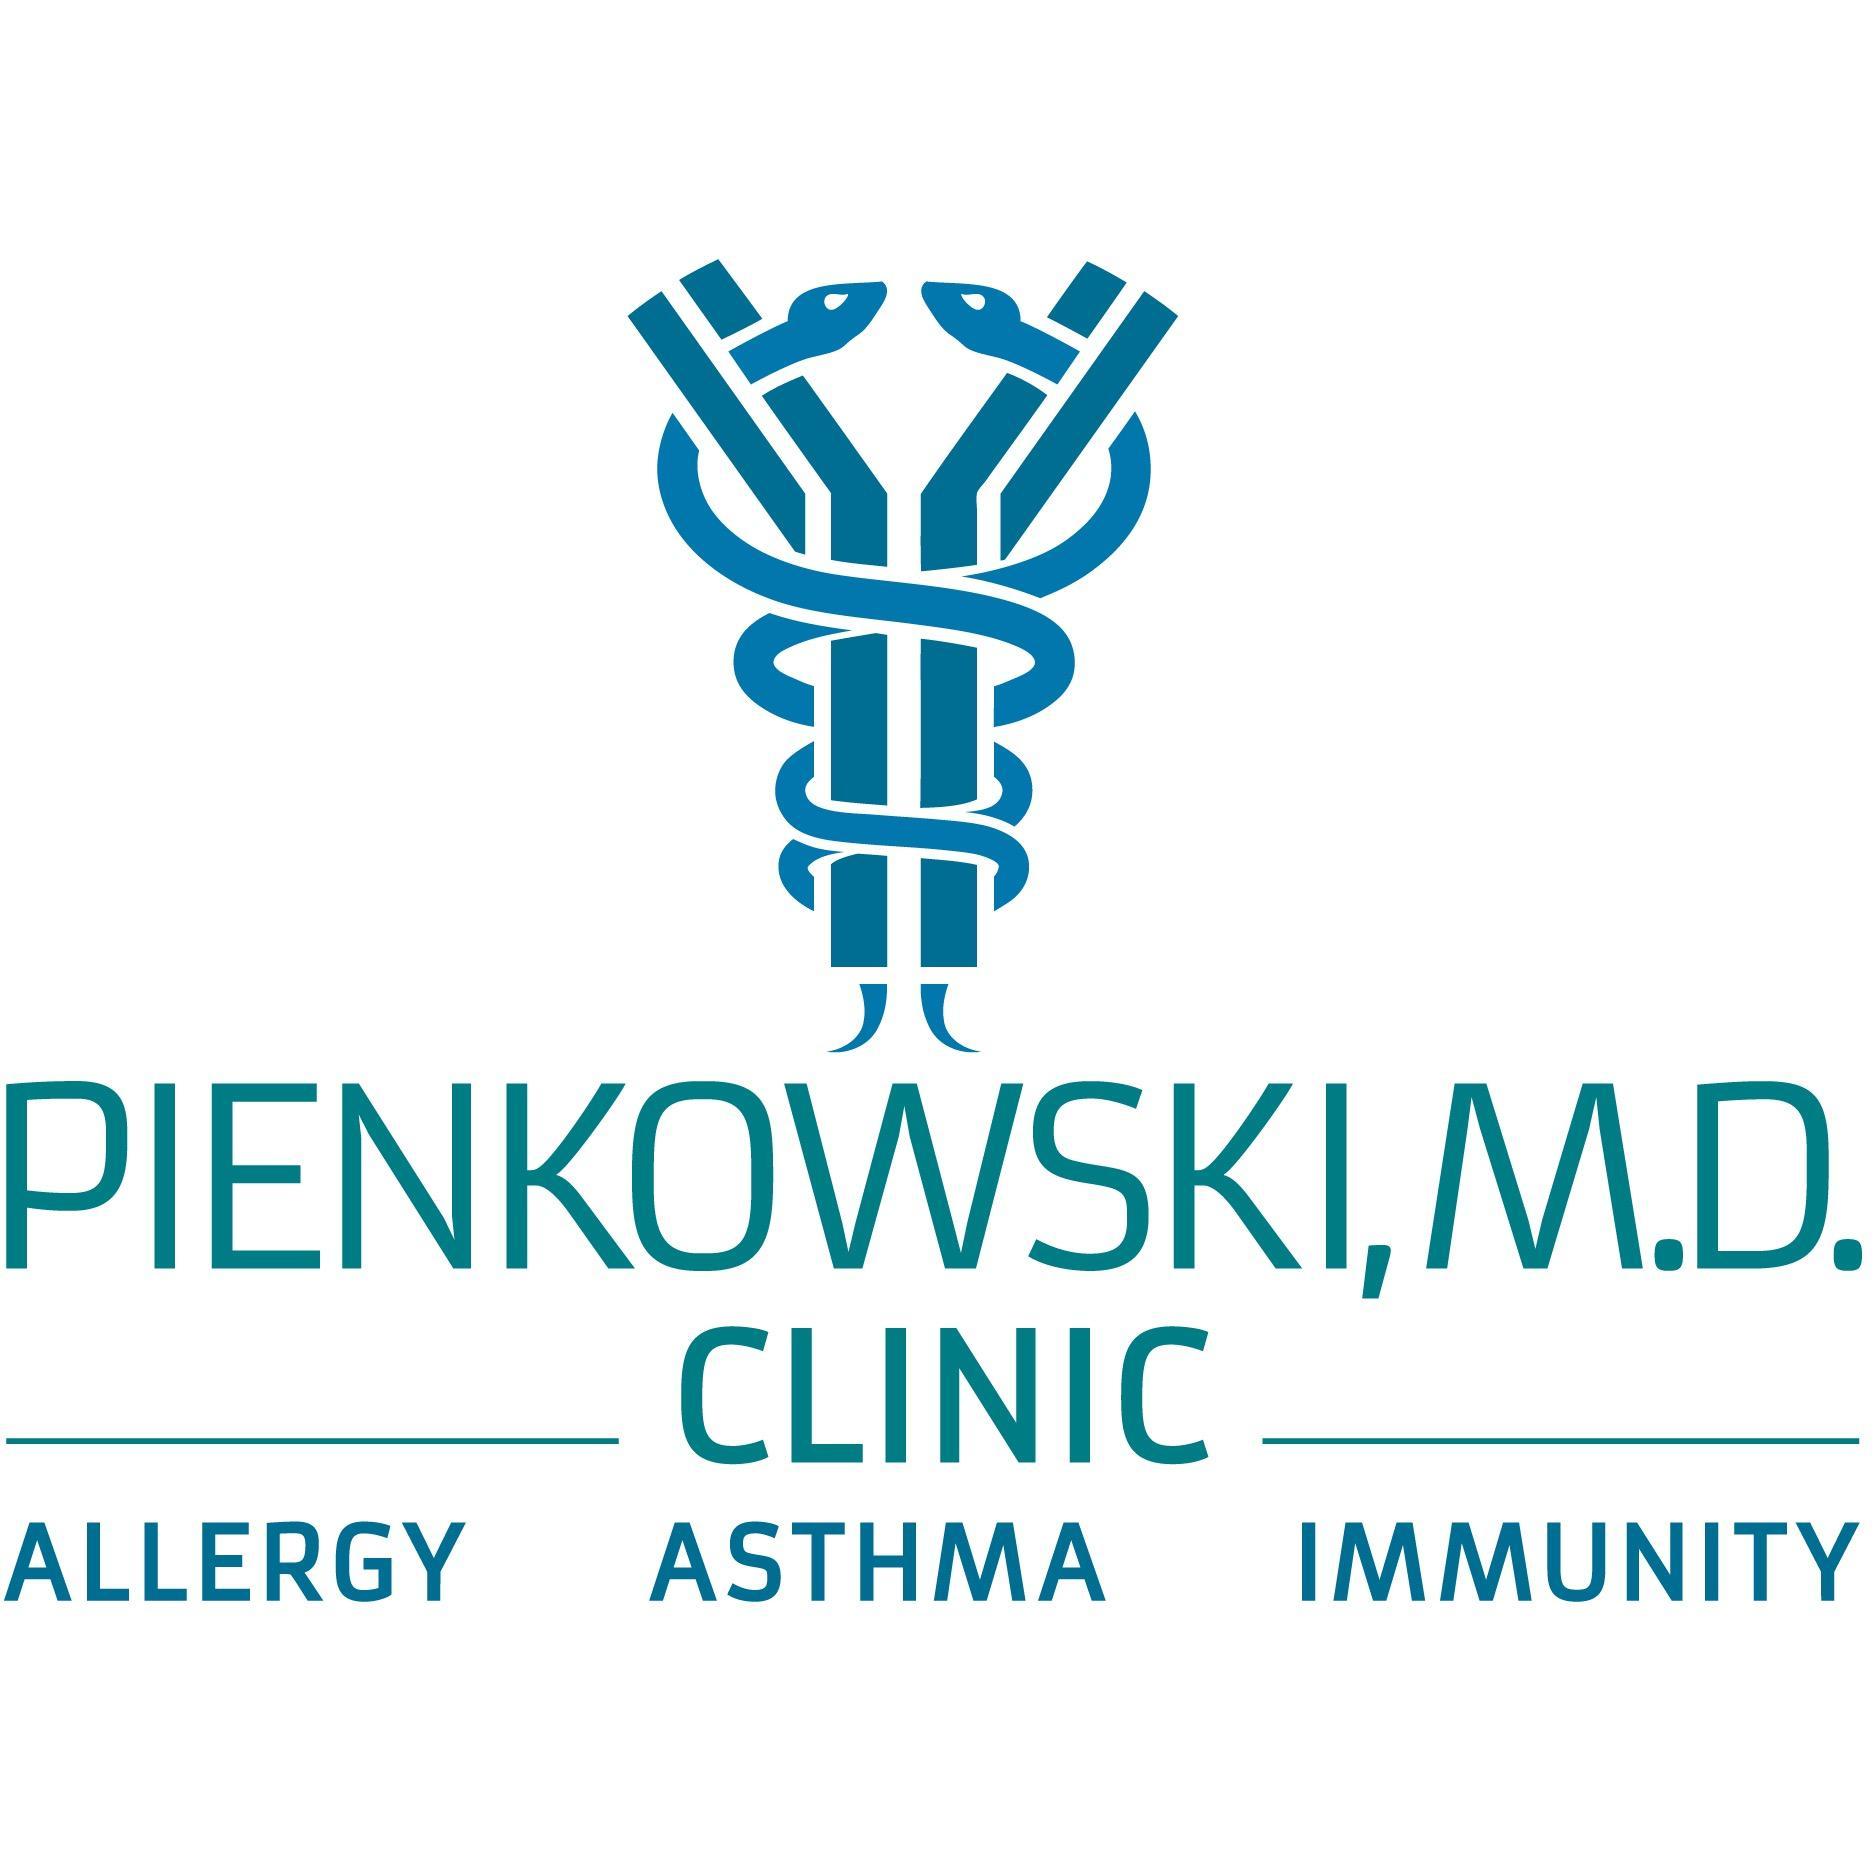 Pienkowski, M.D. Clinic – Allergy Asthma Immunity image 3